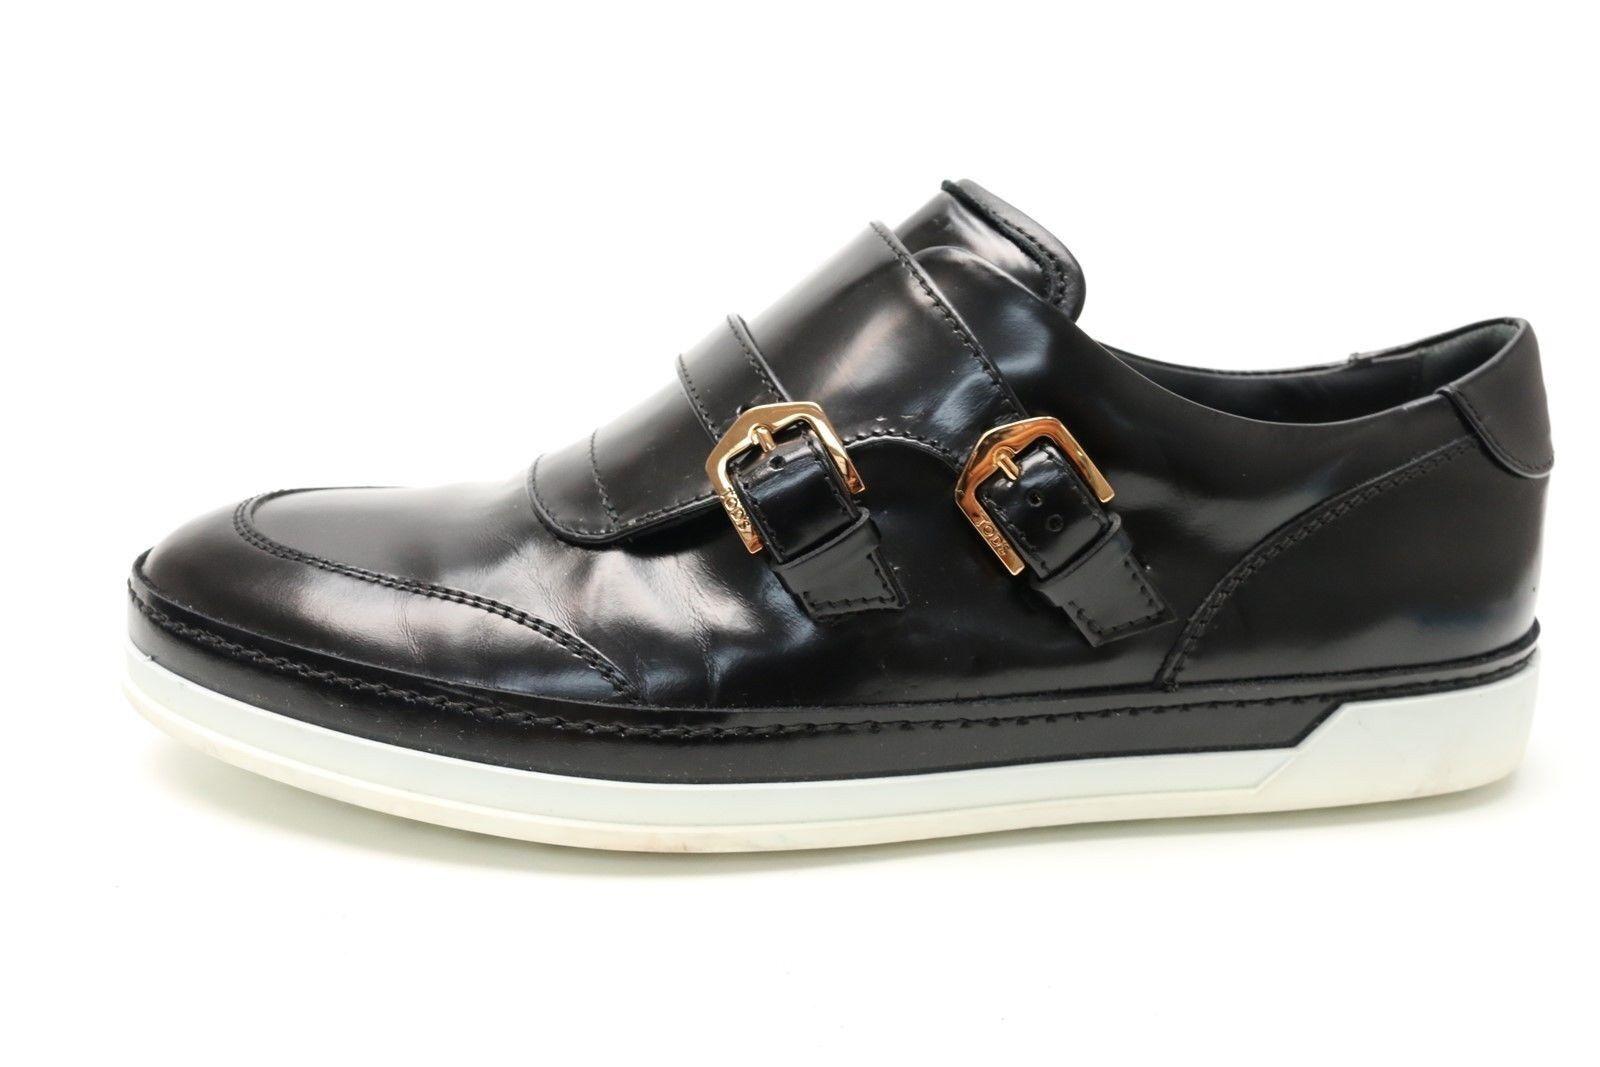 Womens TODS black leather double monkstrap fashion sneakers sz. 8.5  450